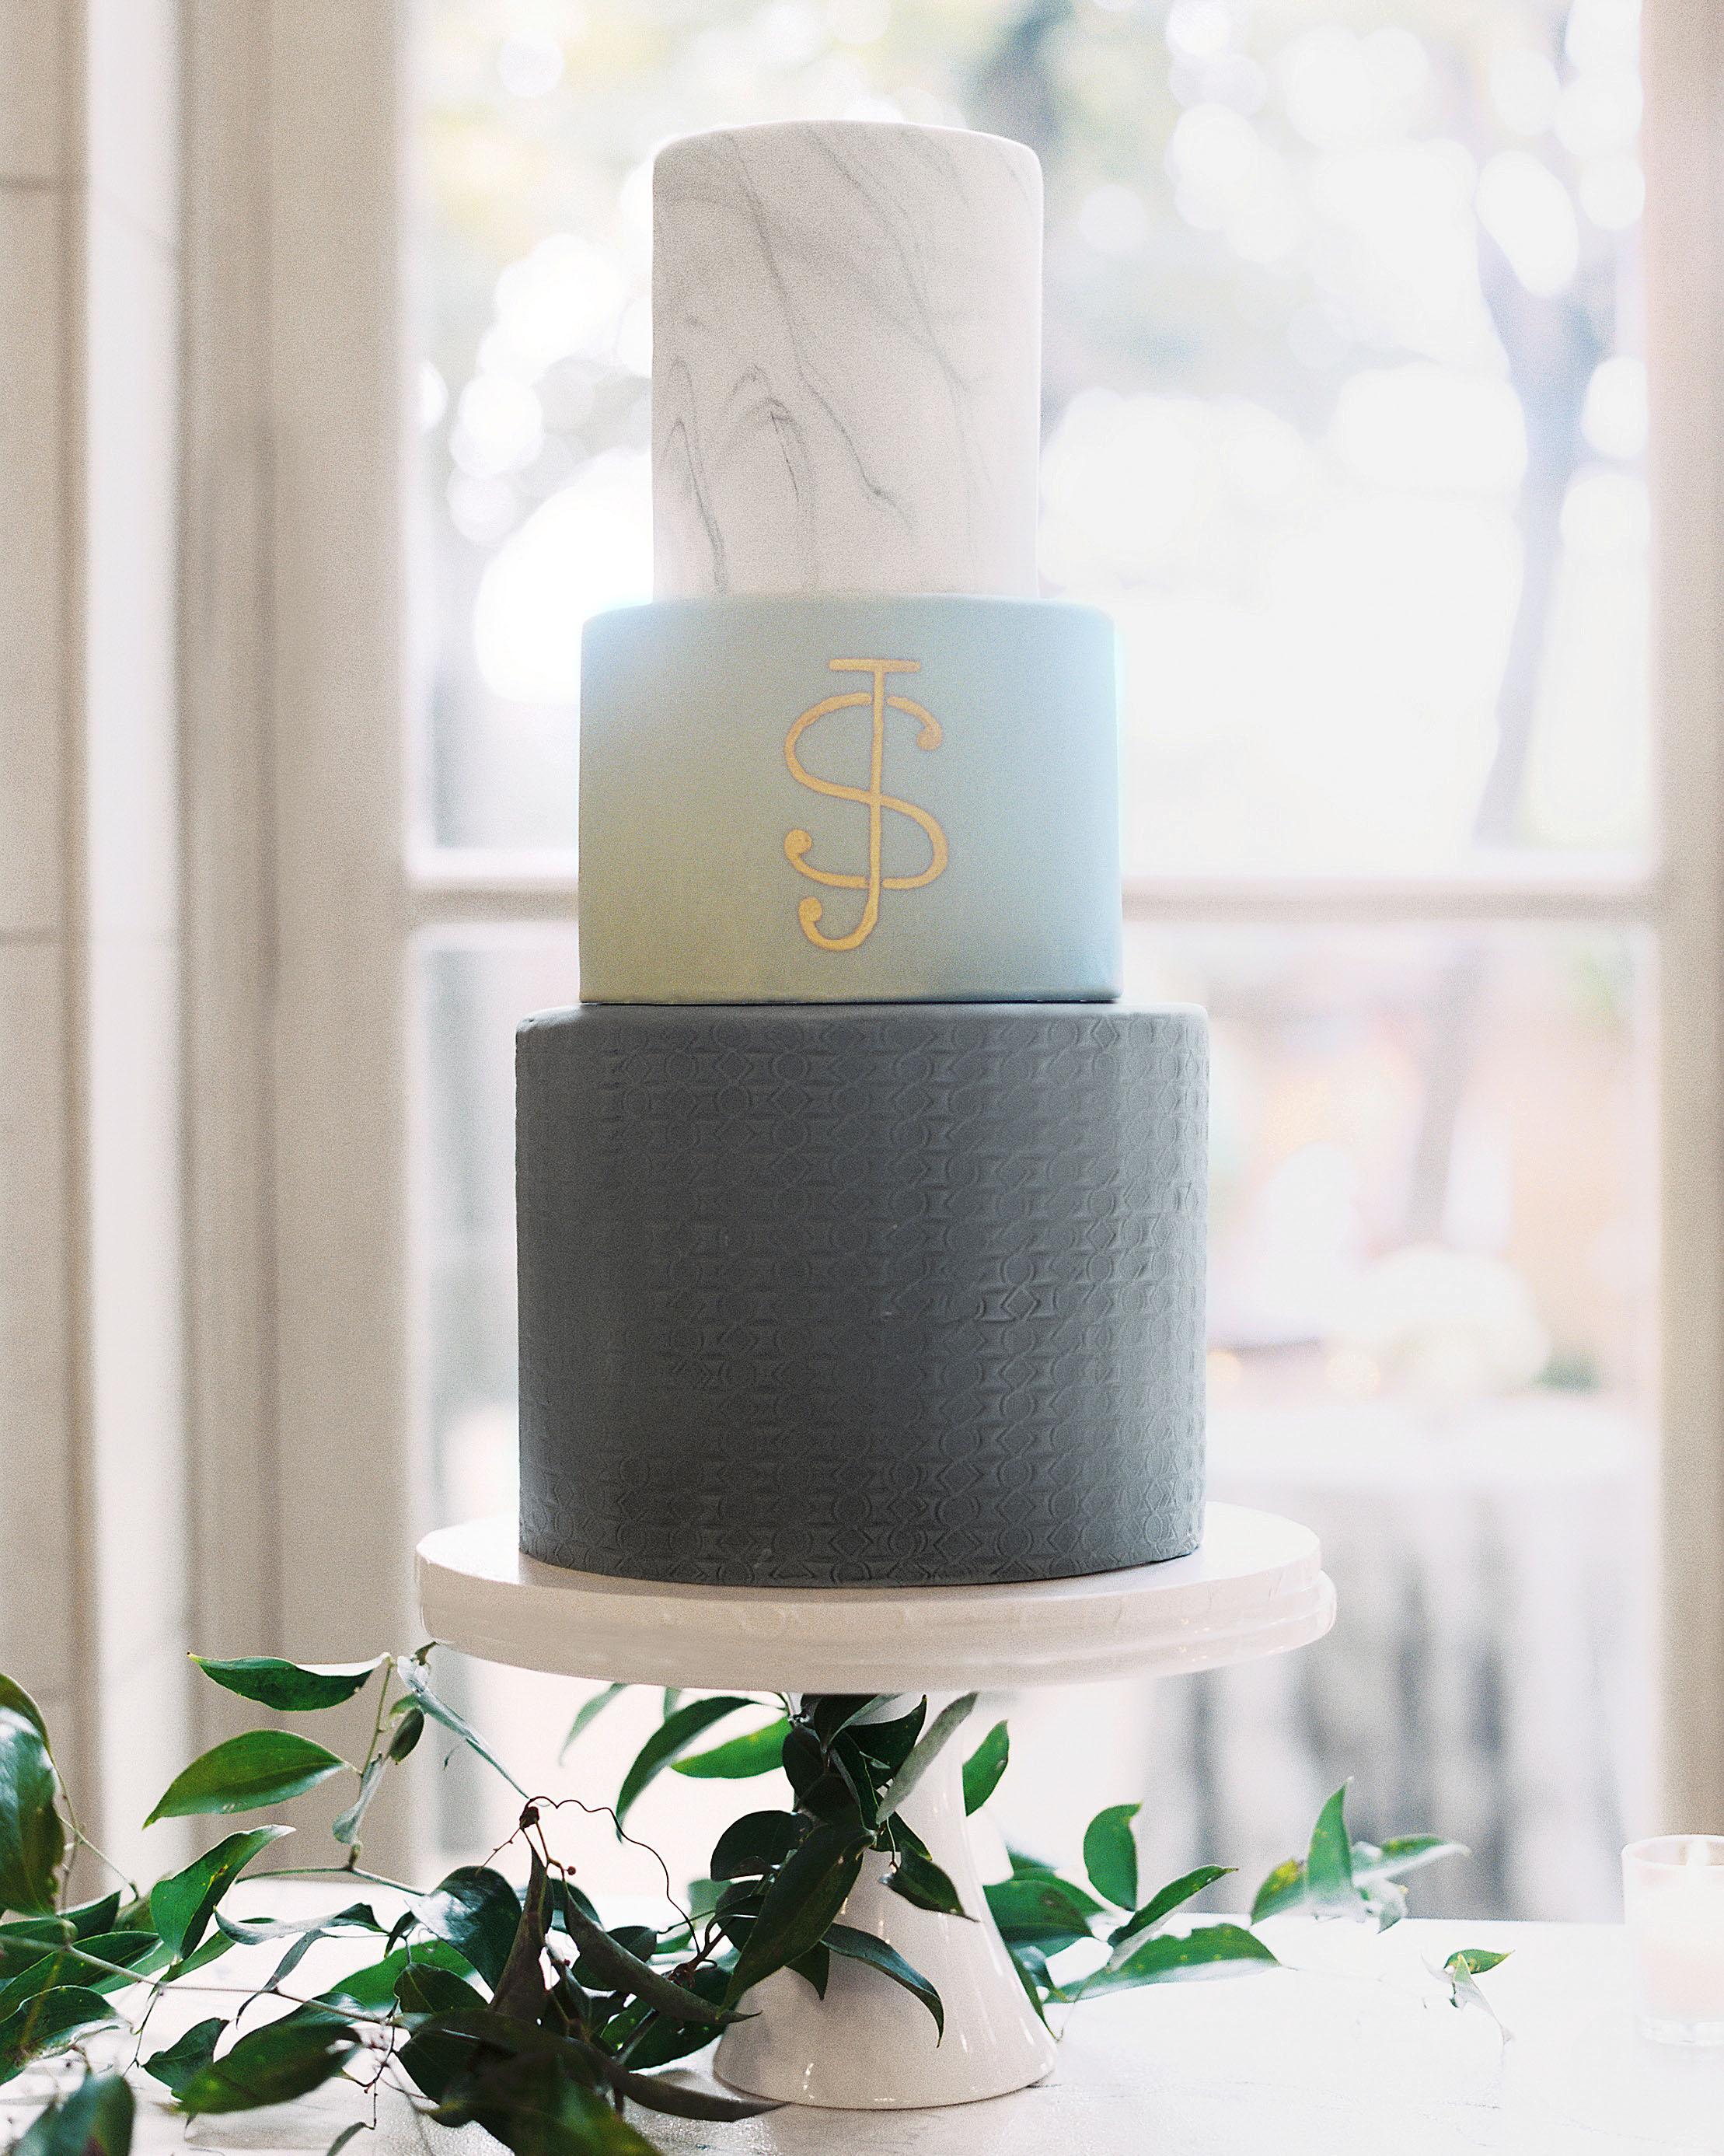 jermaine scott wedding dc bourbon monogram cake